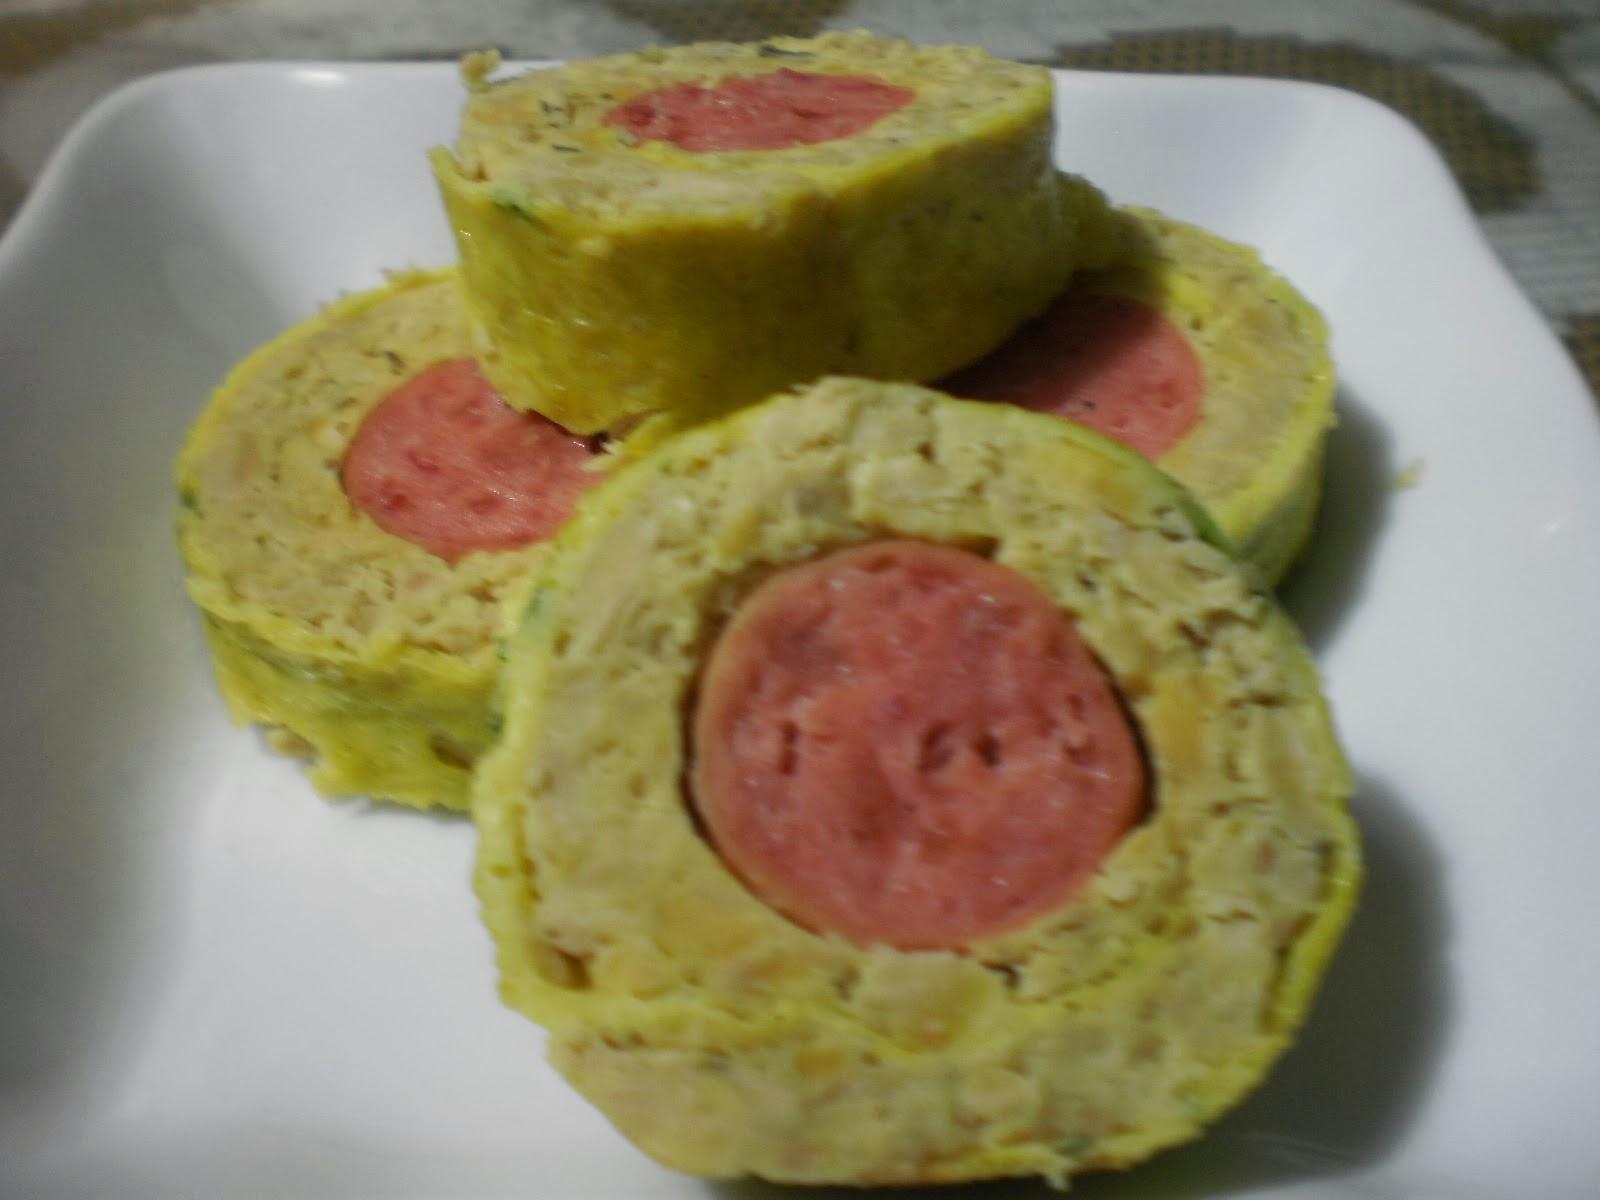 Resep Masakan Tahu Gulung Sosis Pedas